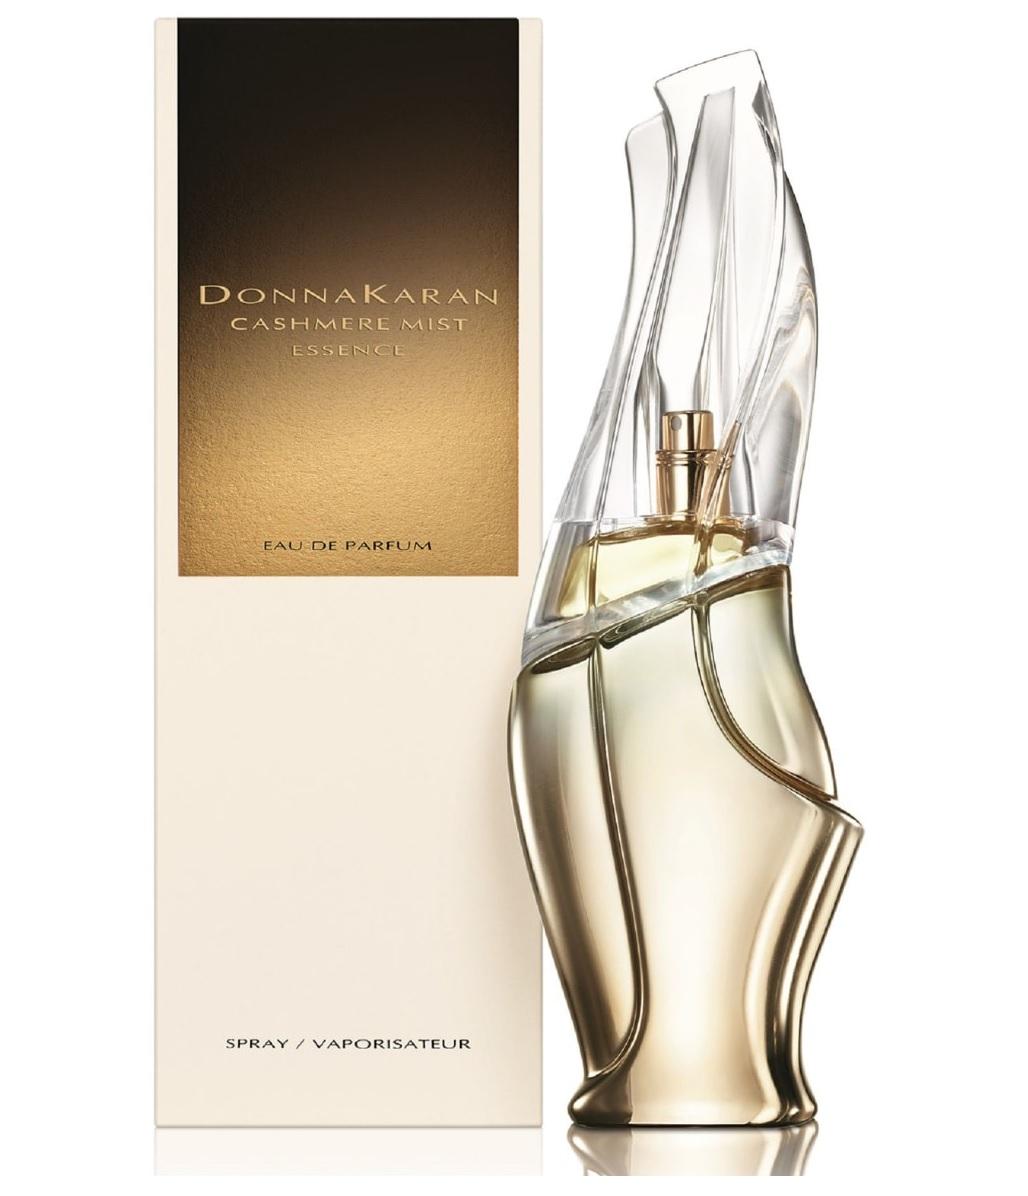 cashmere mist essence donna karan perfume a new. Black Bedroom Furniture Sets. Home Design Ideas